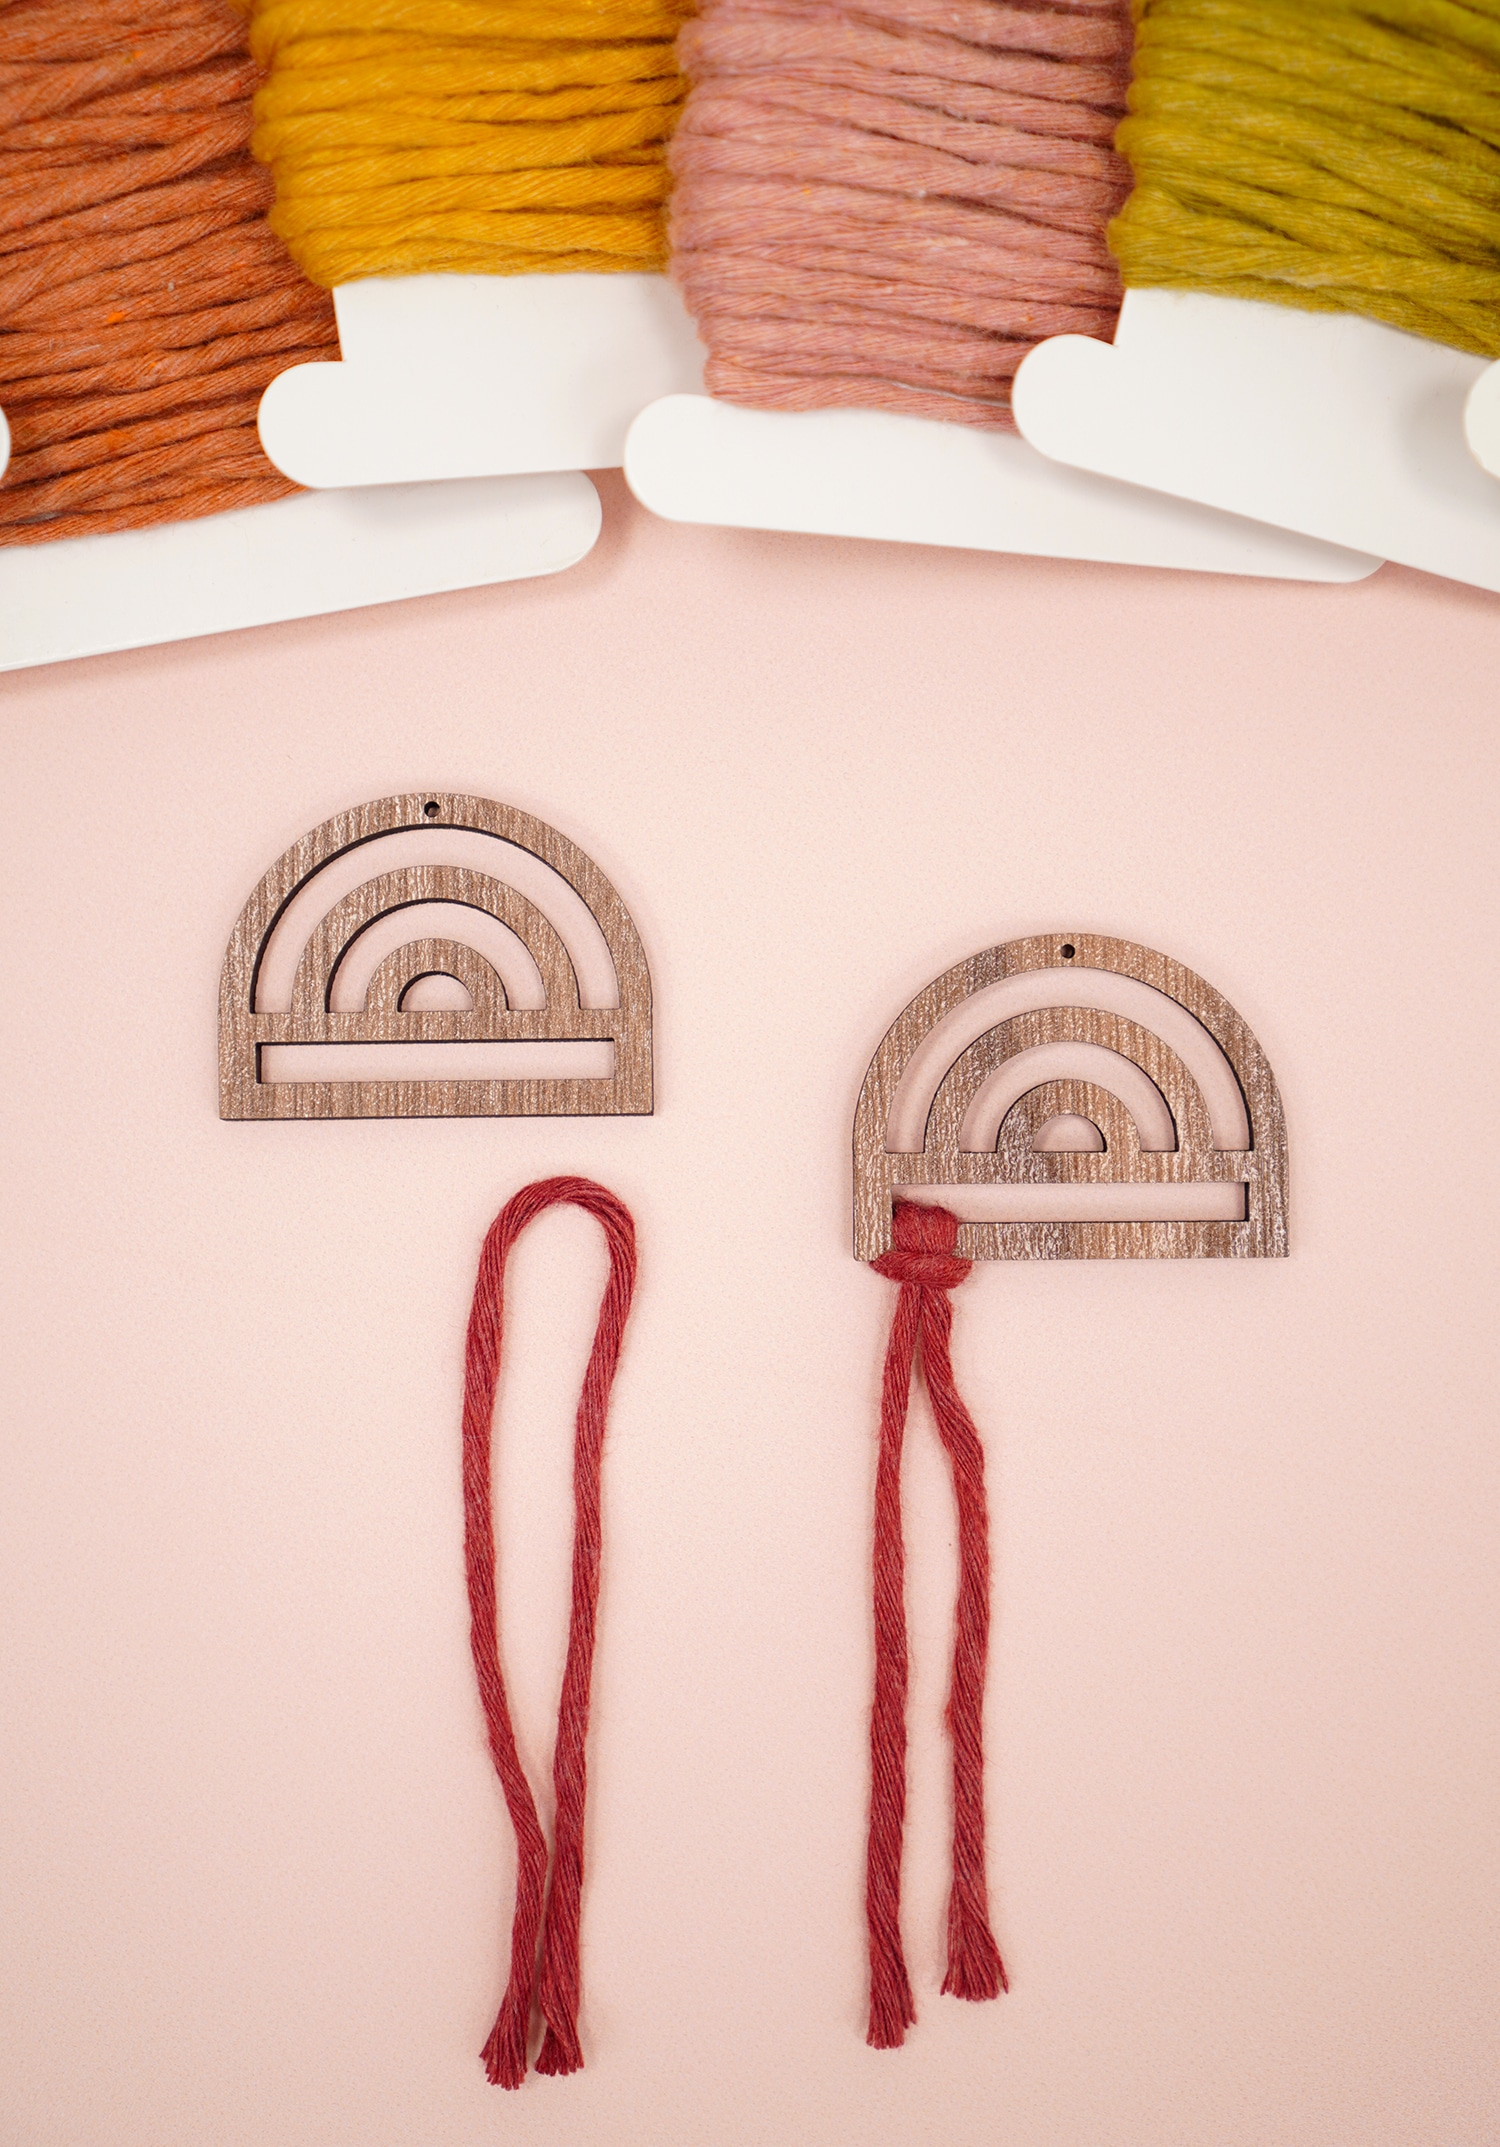 Rainbow Wood Macrame Earring Frames and Cording on peach background